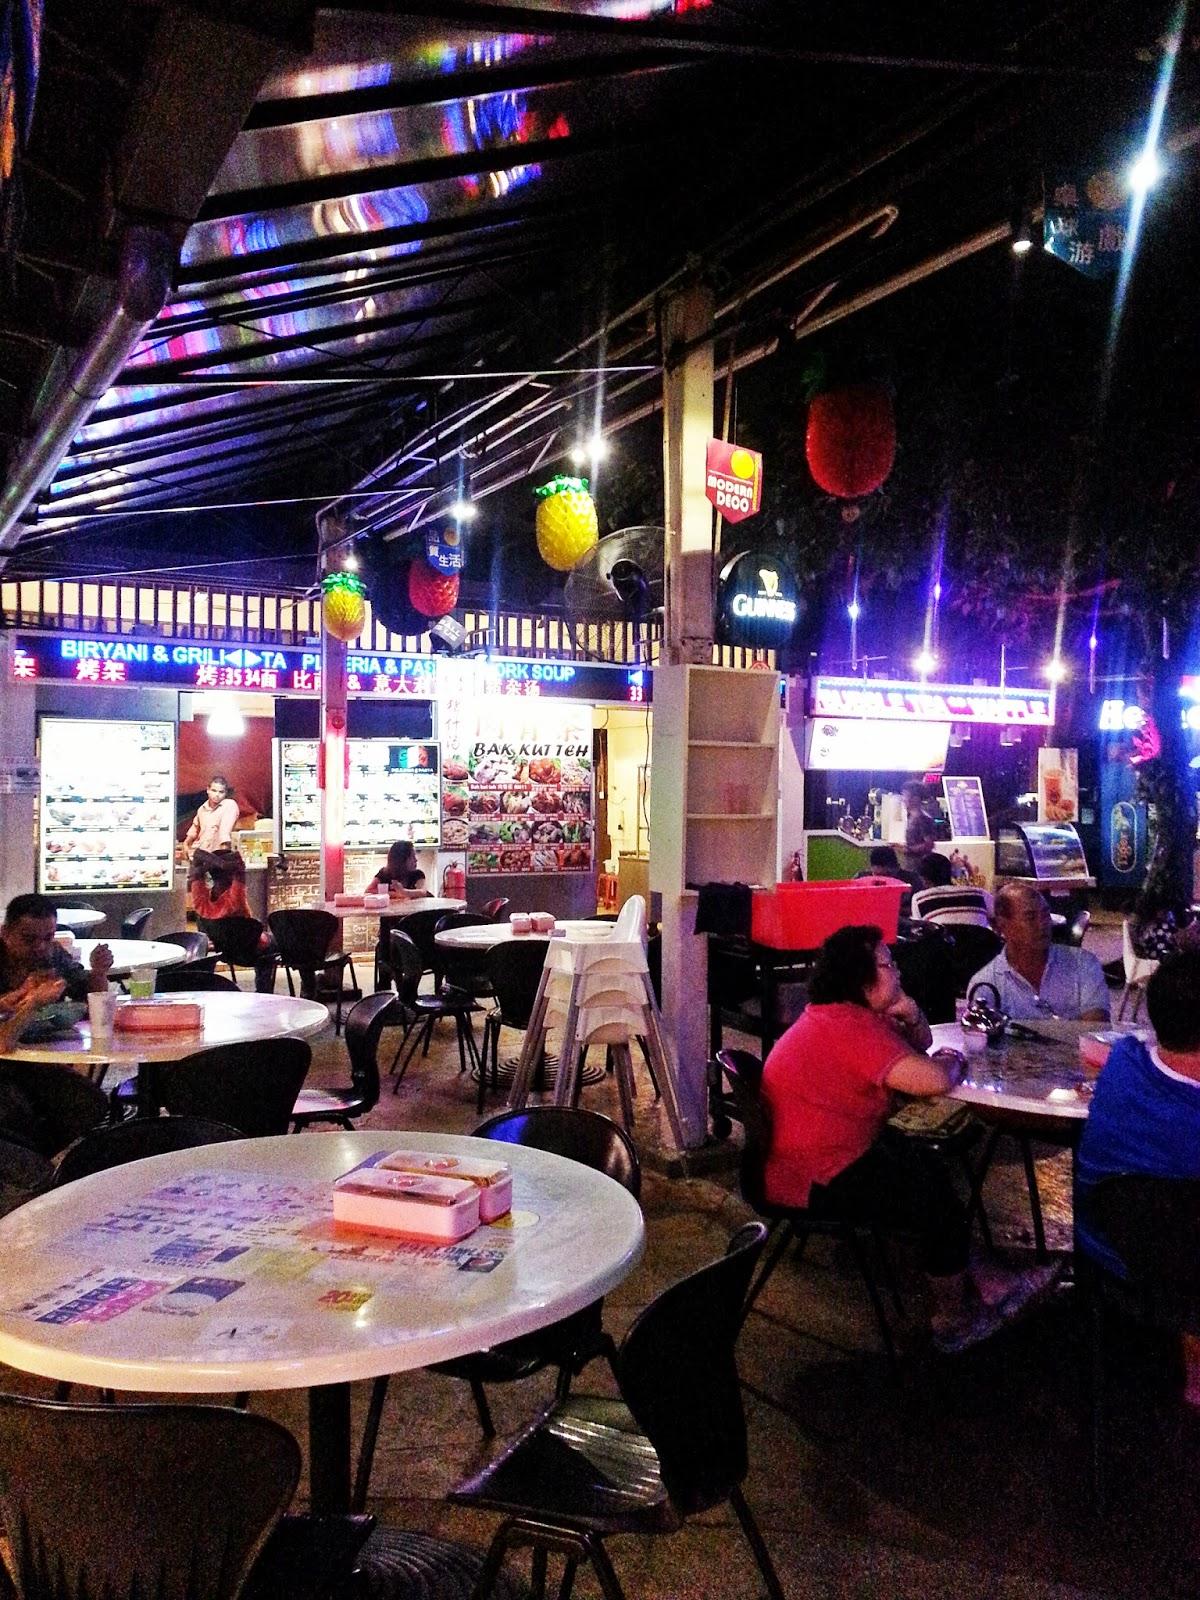 Venoth 39 s culinary adventures neighbourhood food court for Food bar kota damansara